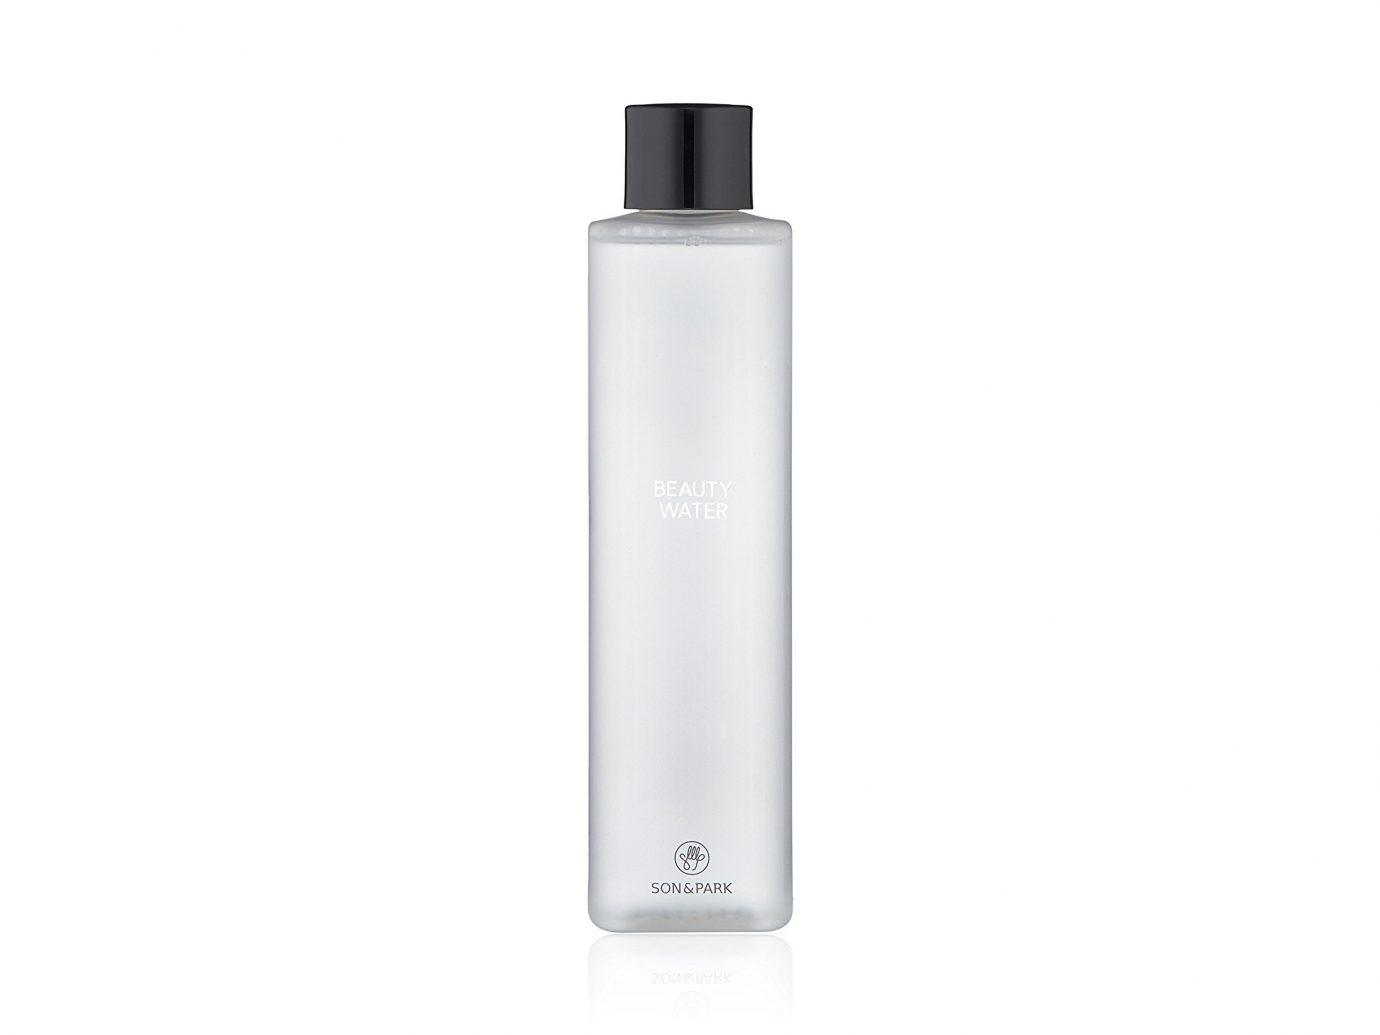 Korean beauty product Son & Park Beauty Water